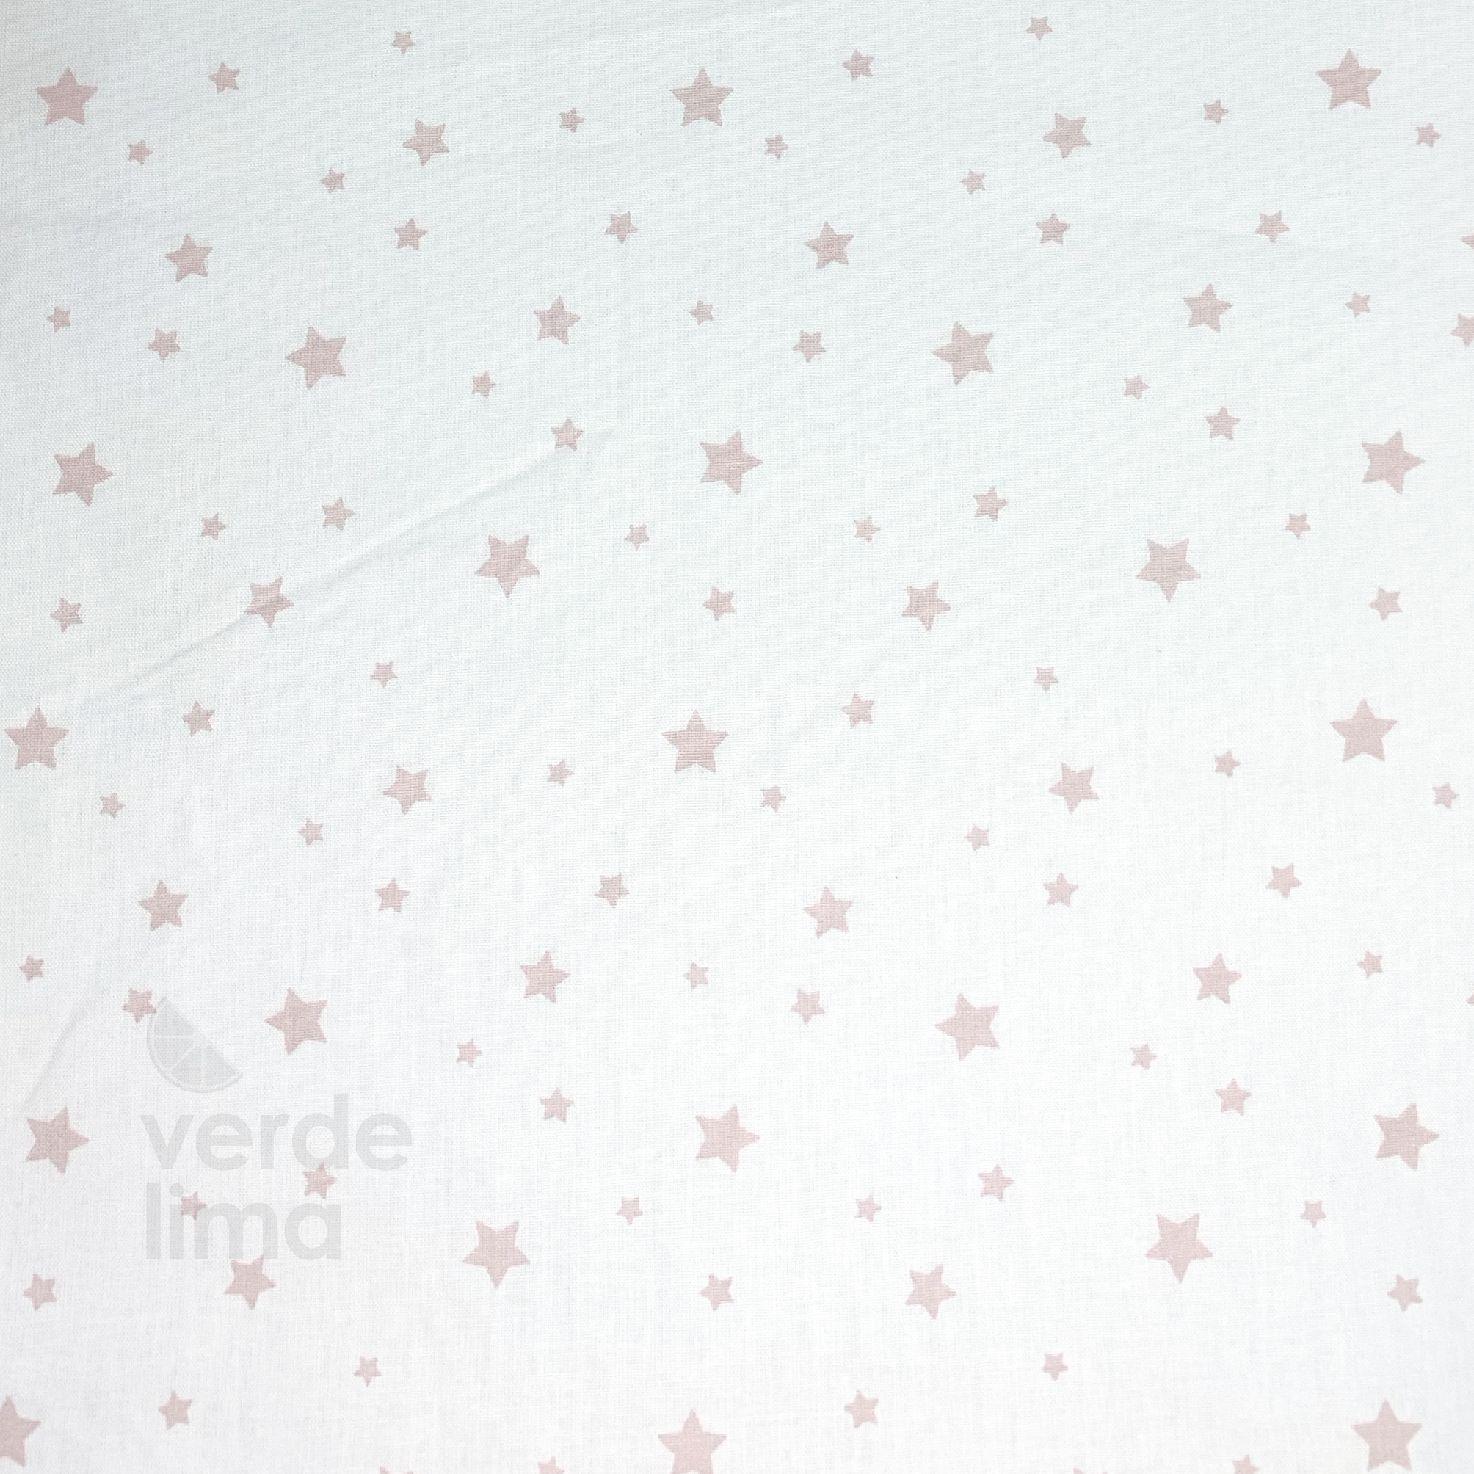 Estrelas rosa velho - fundo branco